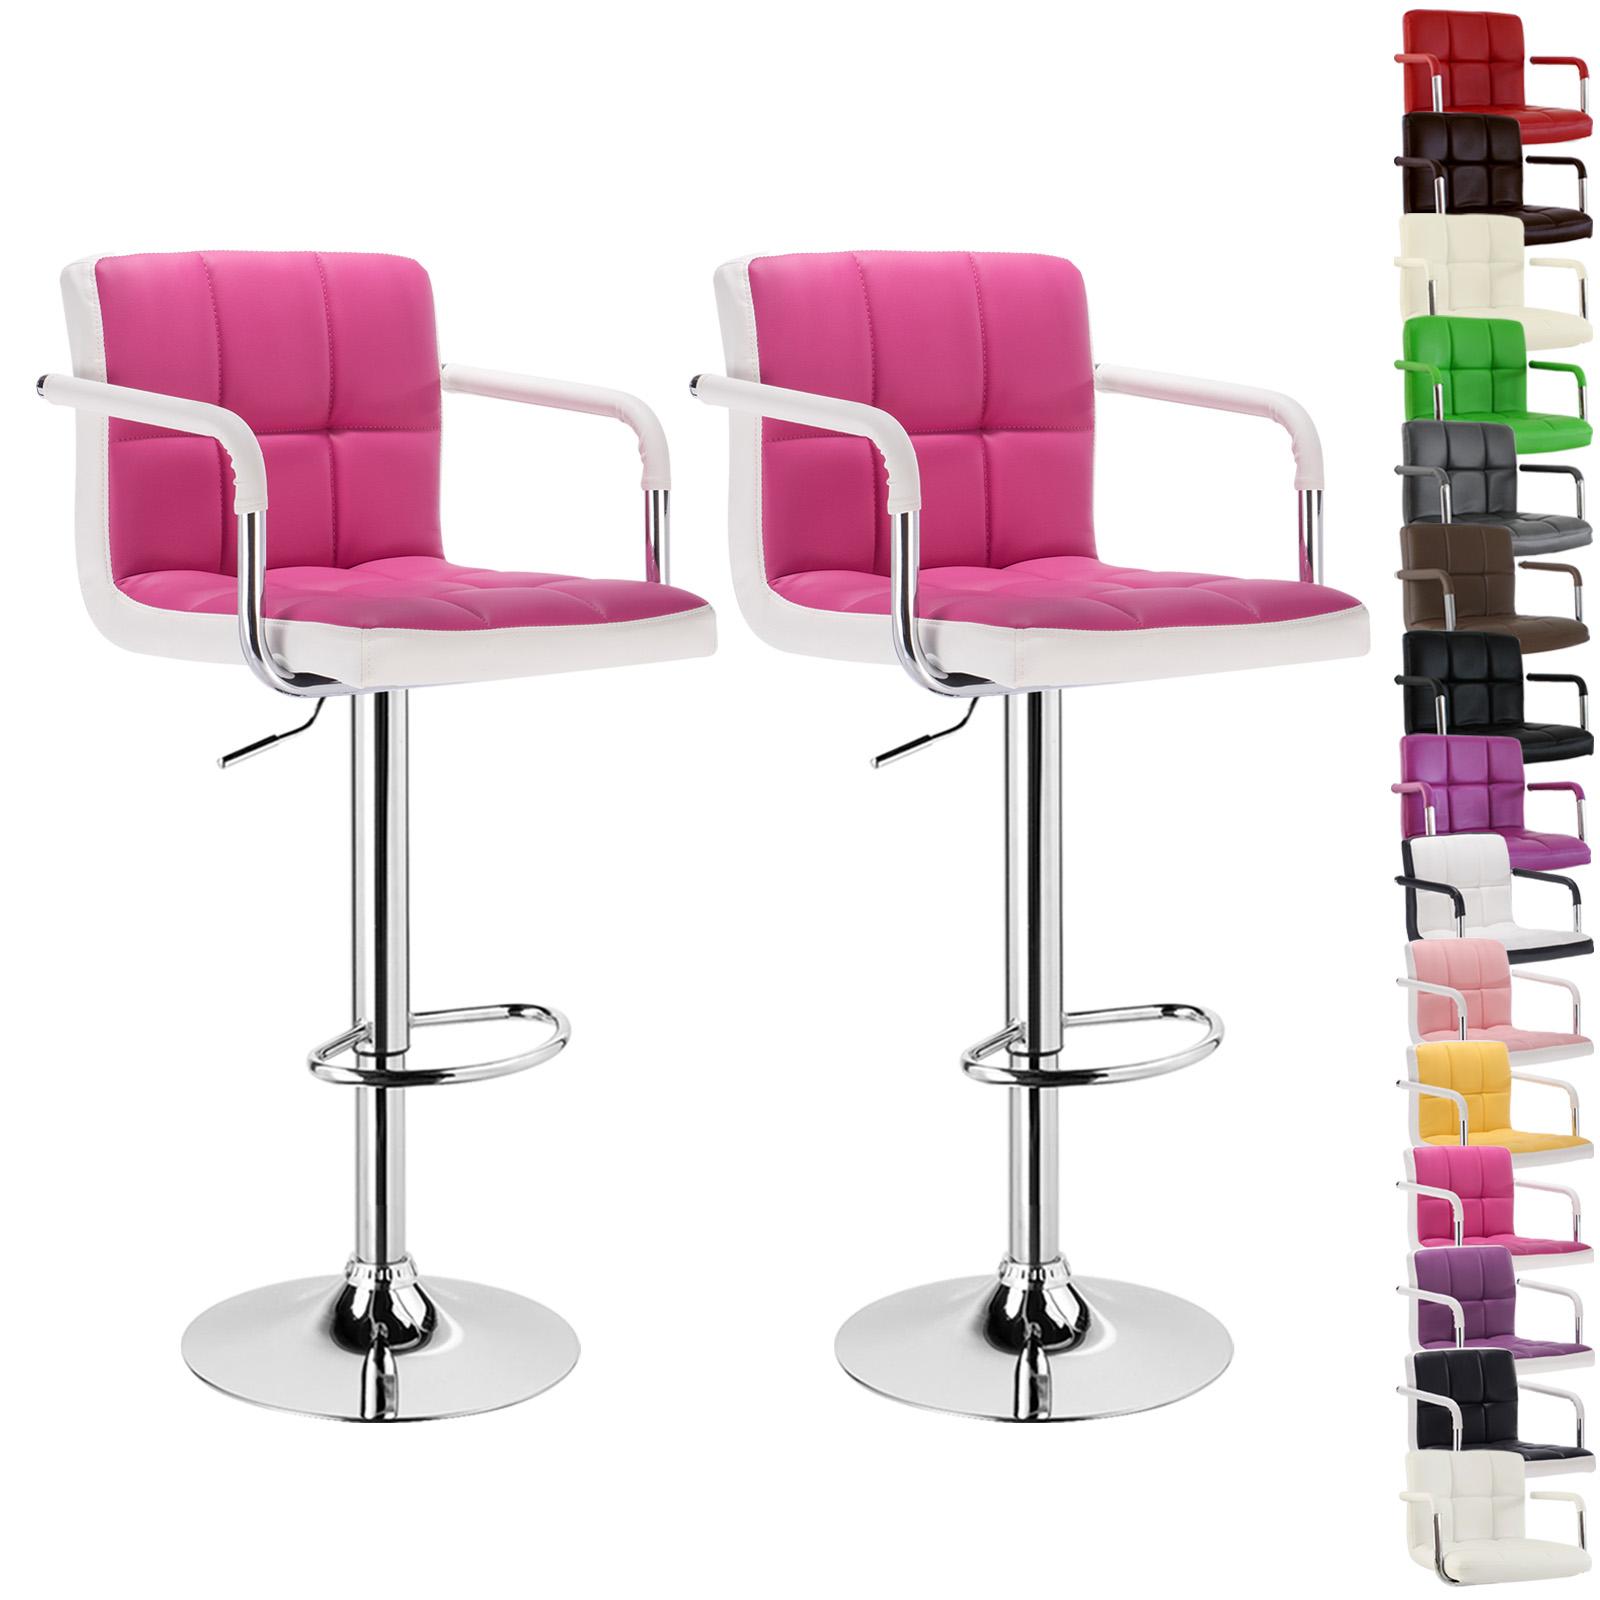 2 tabourets de bar r glable chaise cuisine en cuir artificiel lin f002 ebay. Black Bedroom Furniture Sets. Home Design Ideas